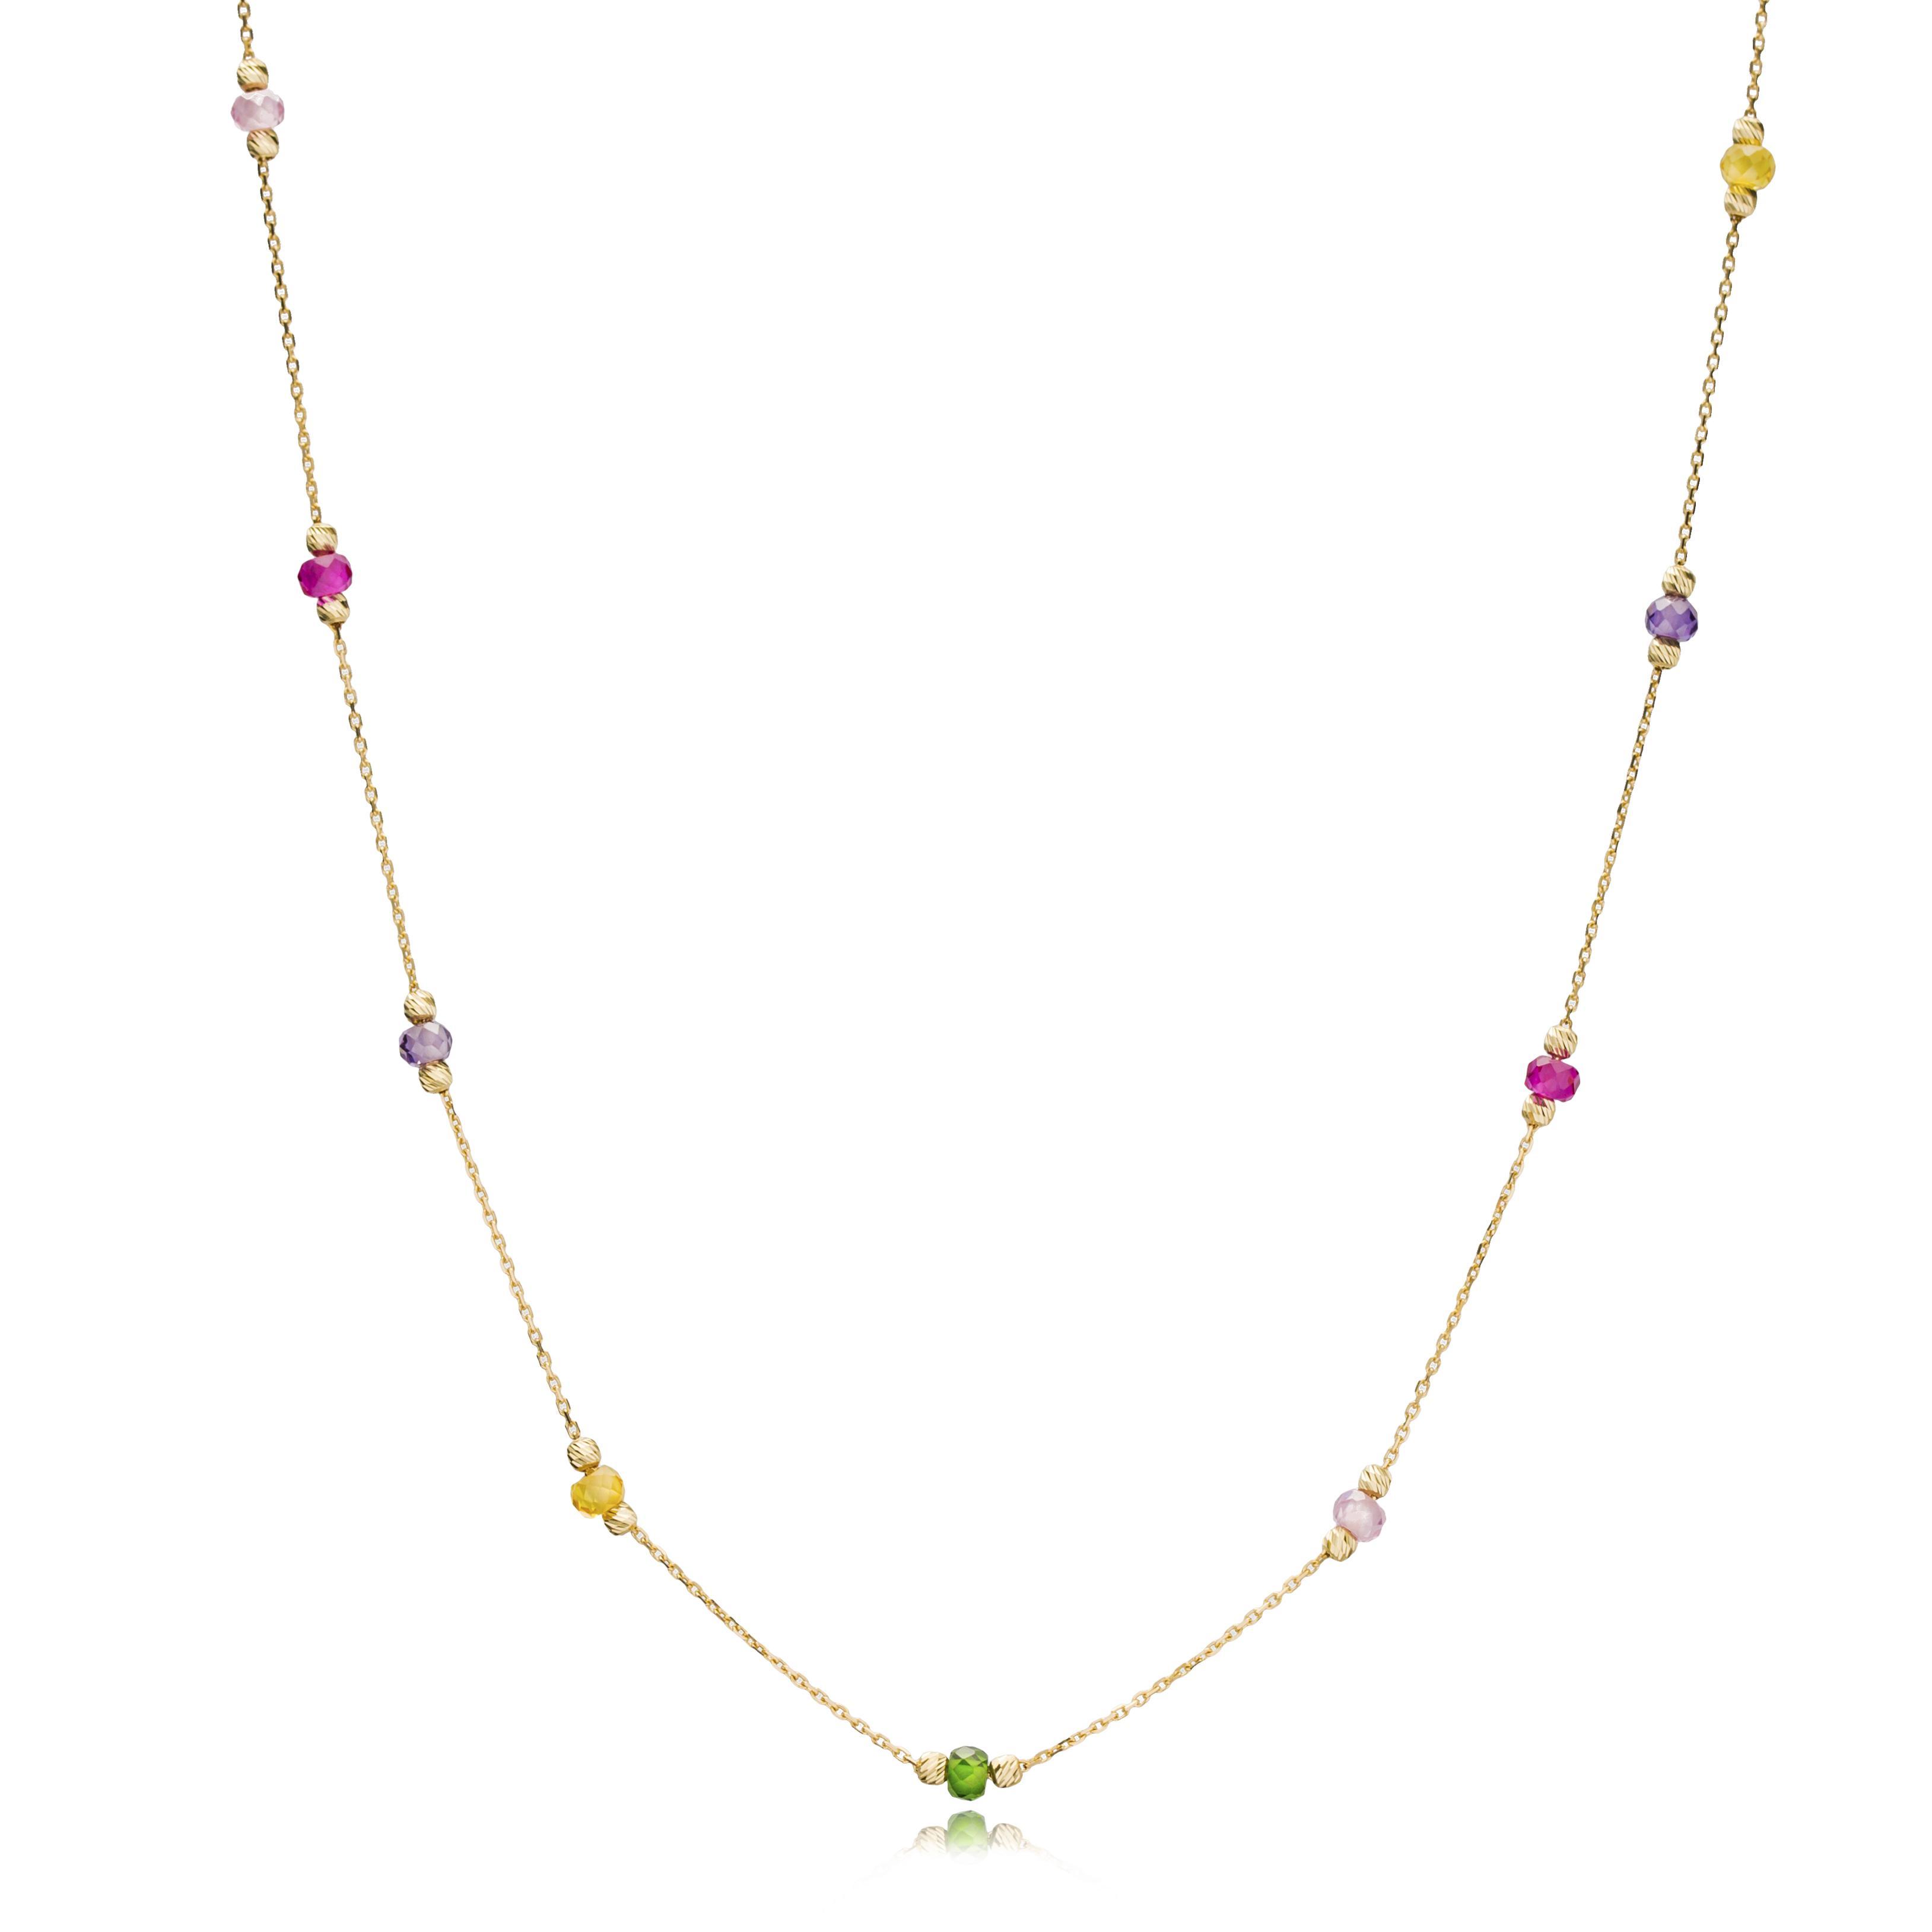 14K Gold Elegant Colorful Stone Pendant Wholesale Handmade Turkish Jewelry